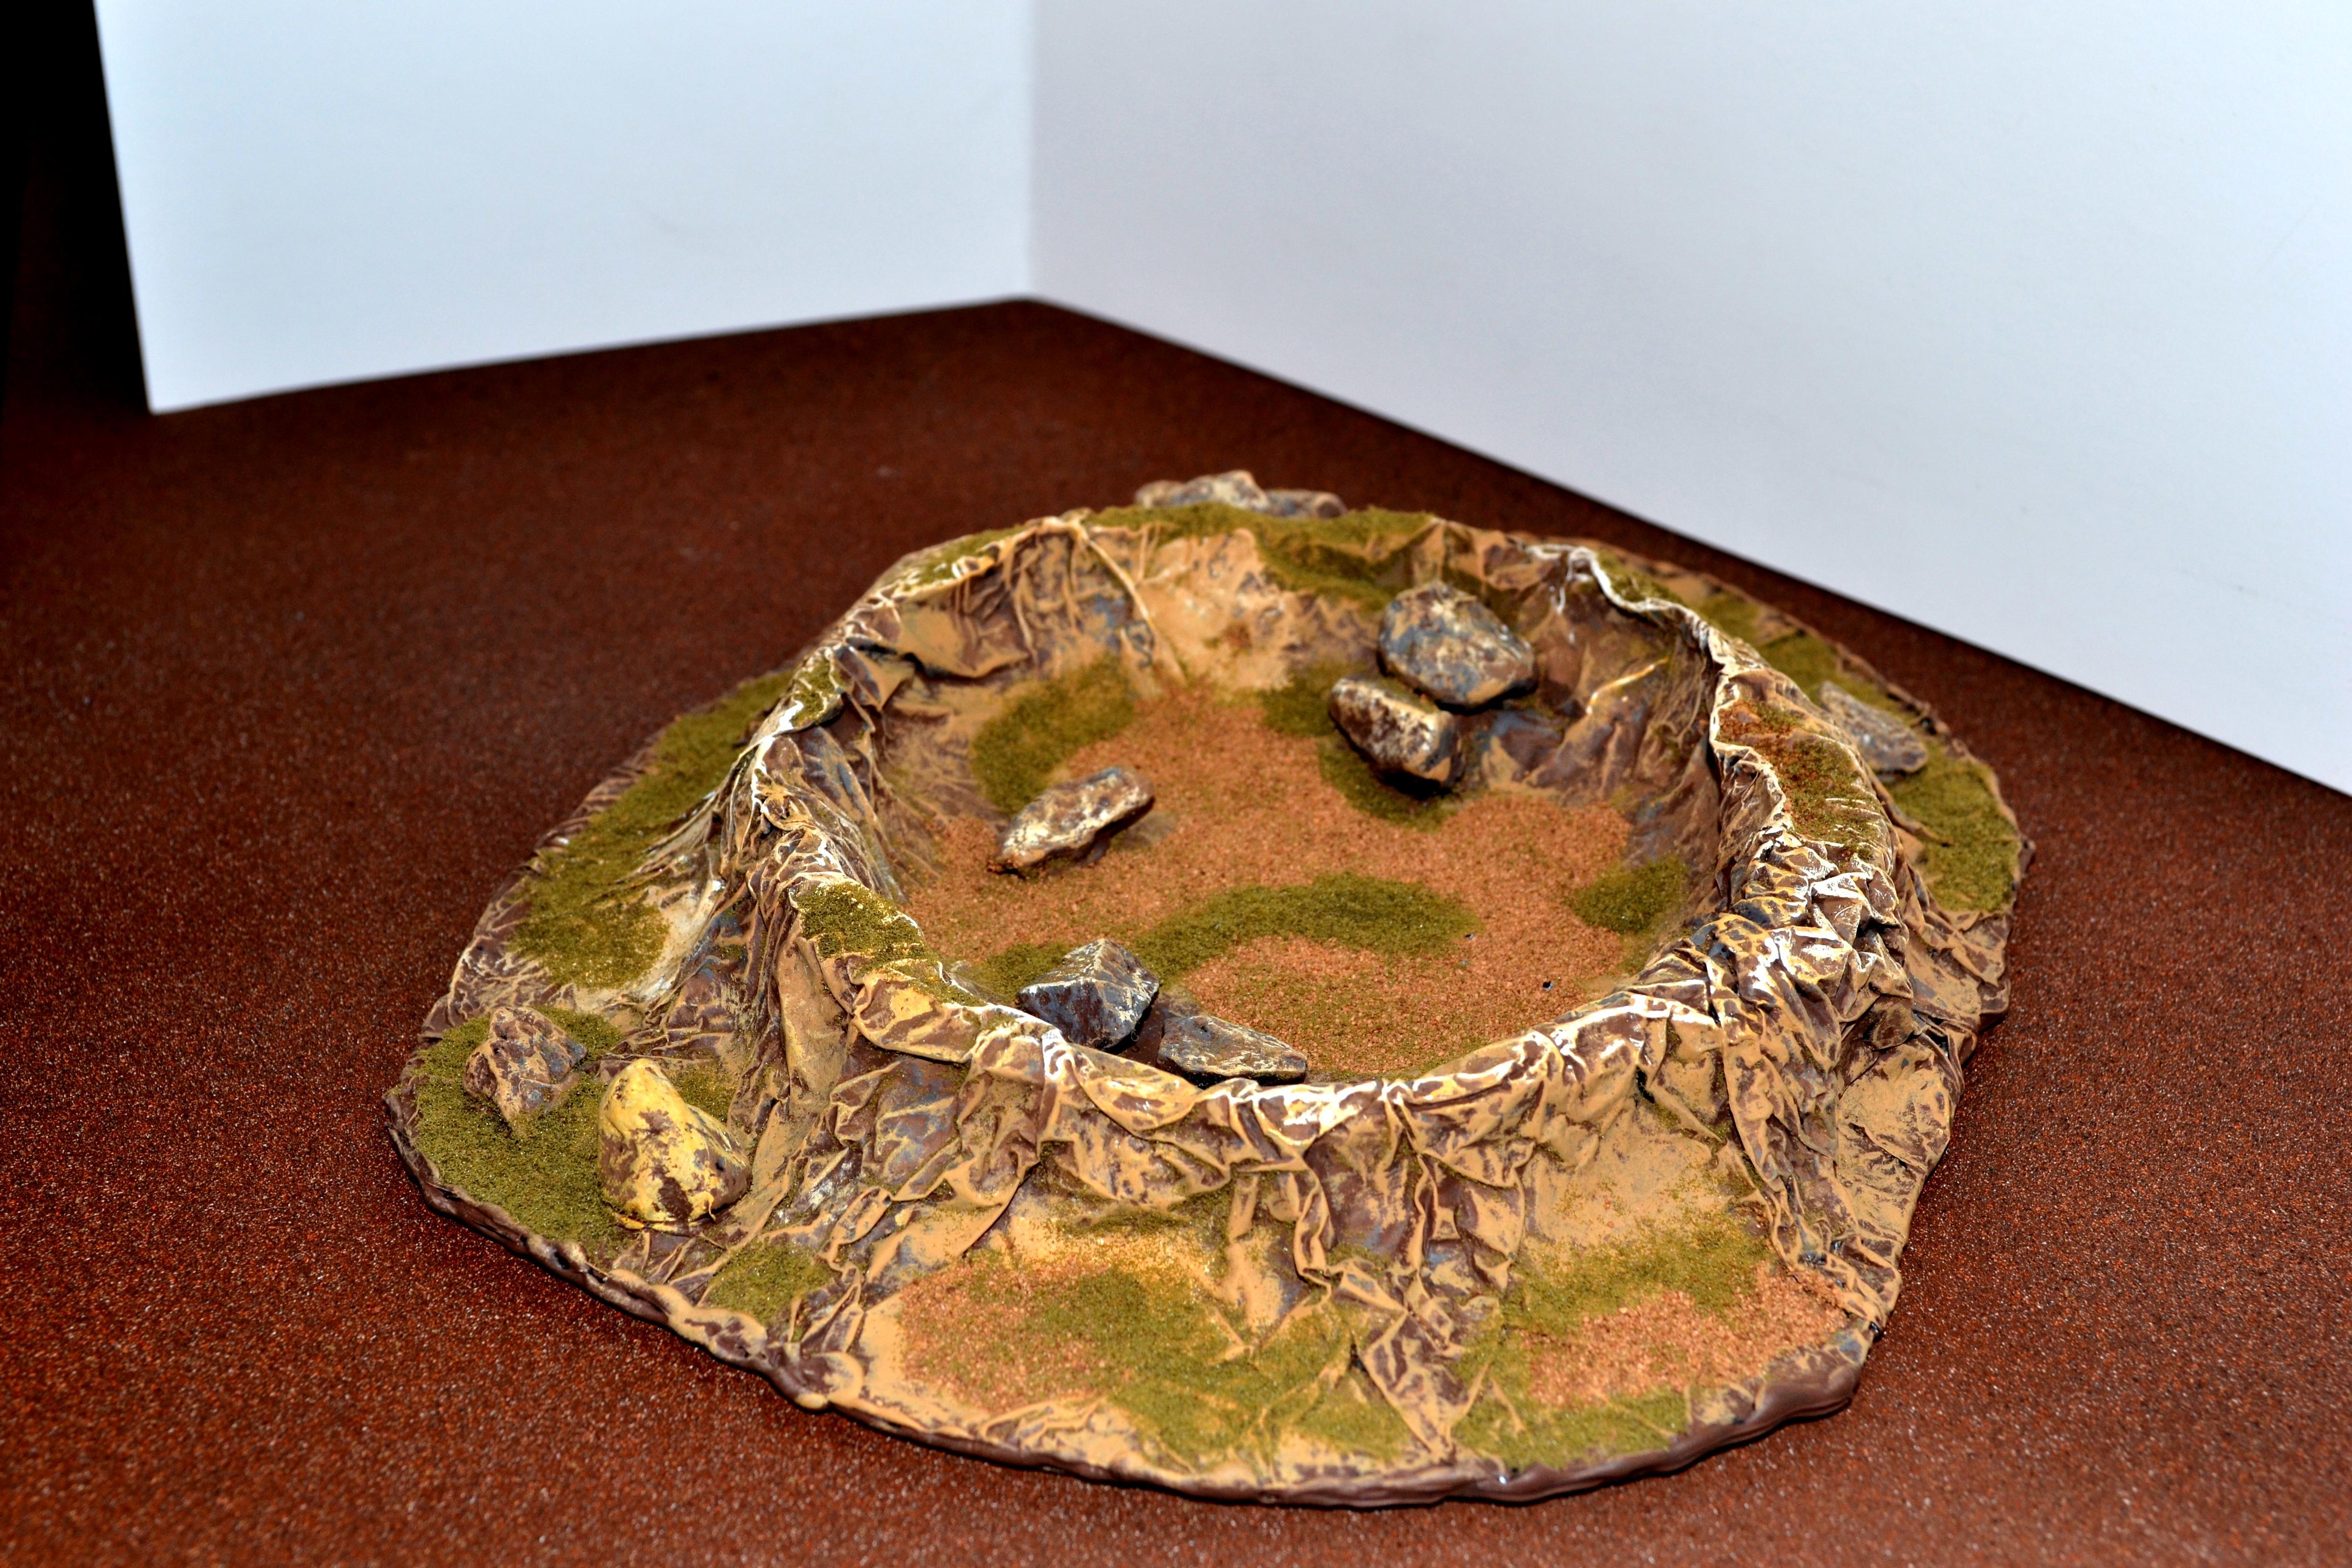 Crater, Orks, Terrain, Warhammer 40,000